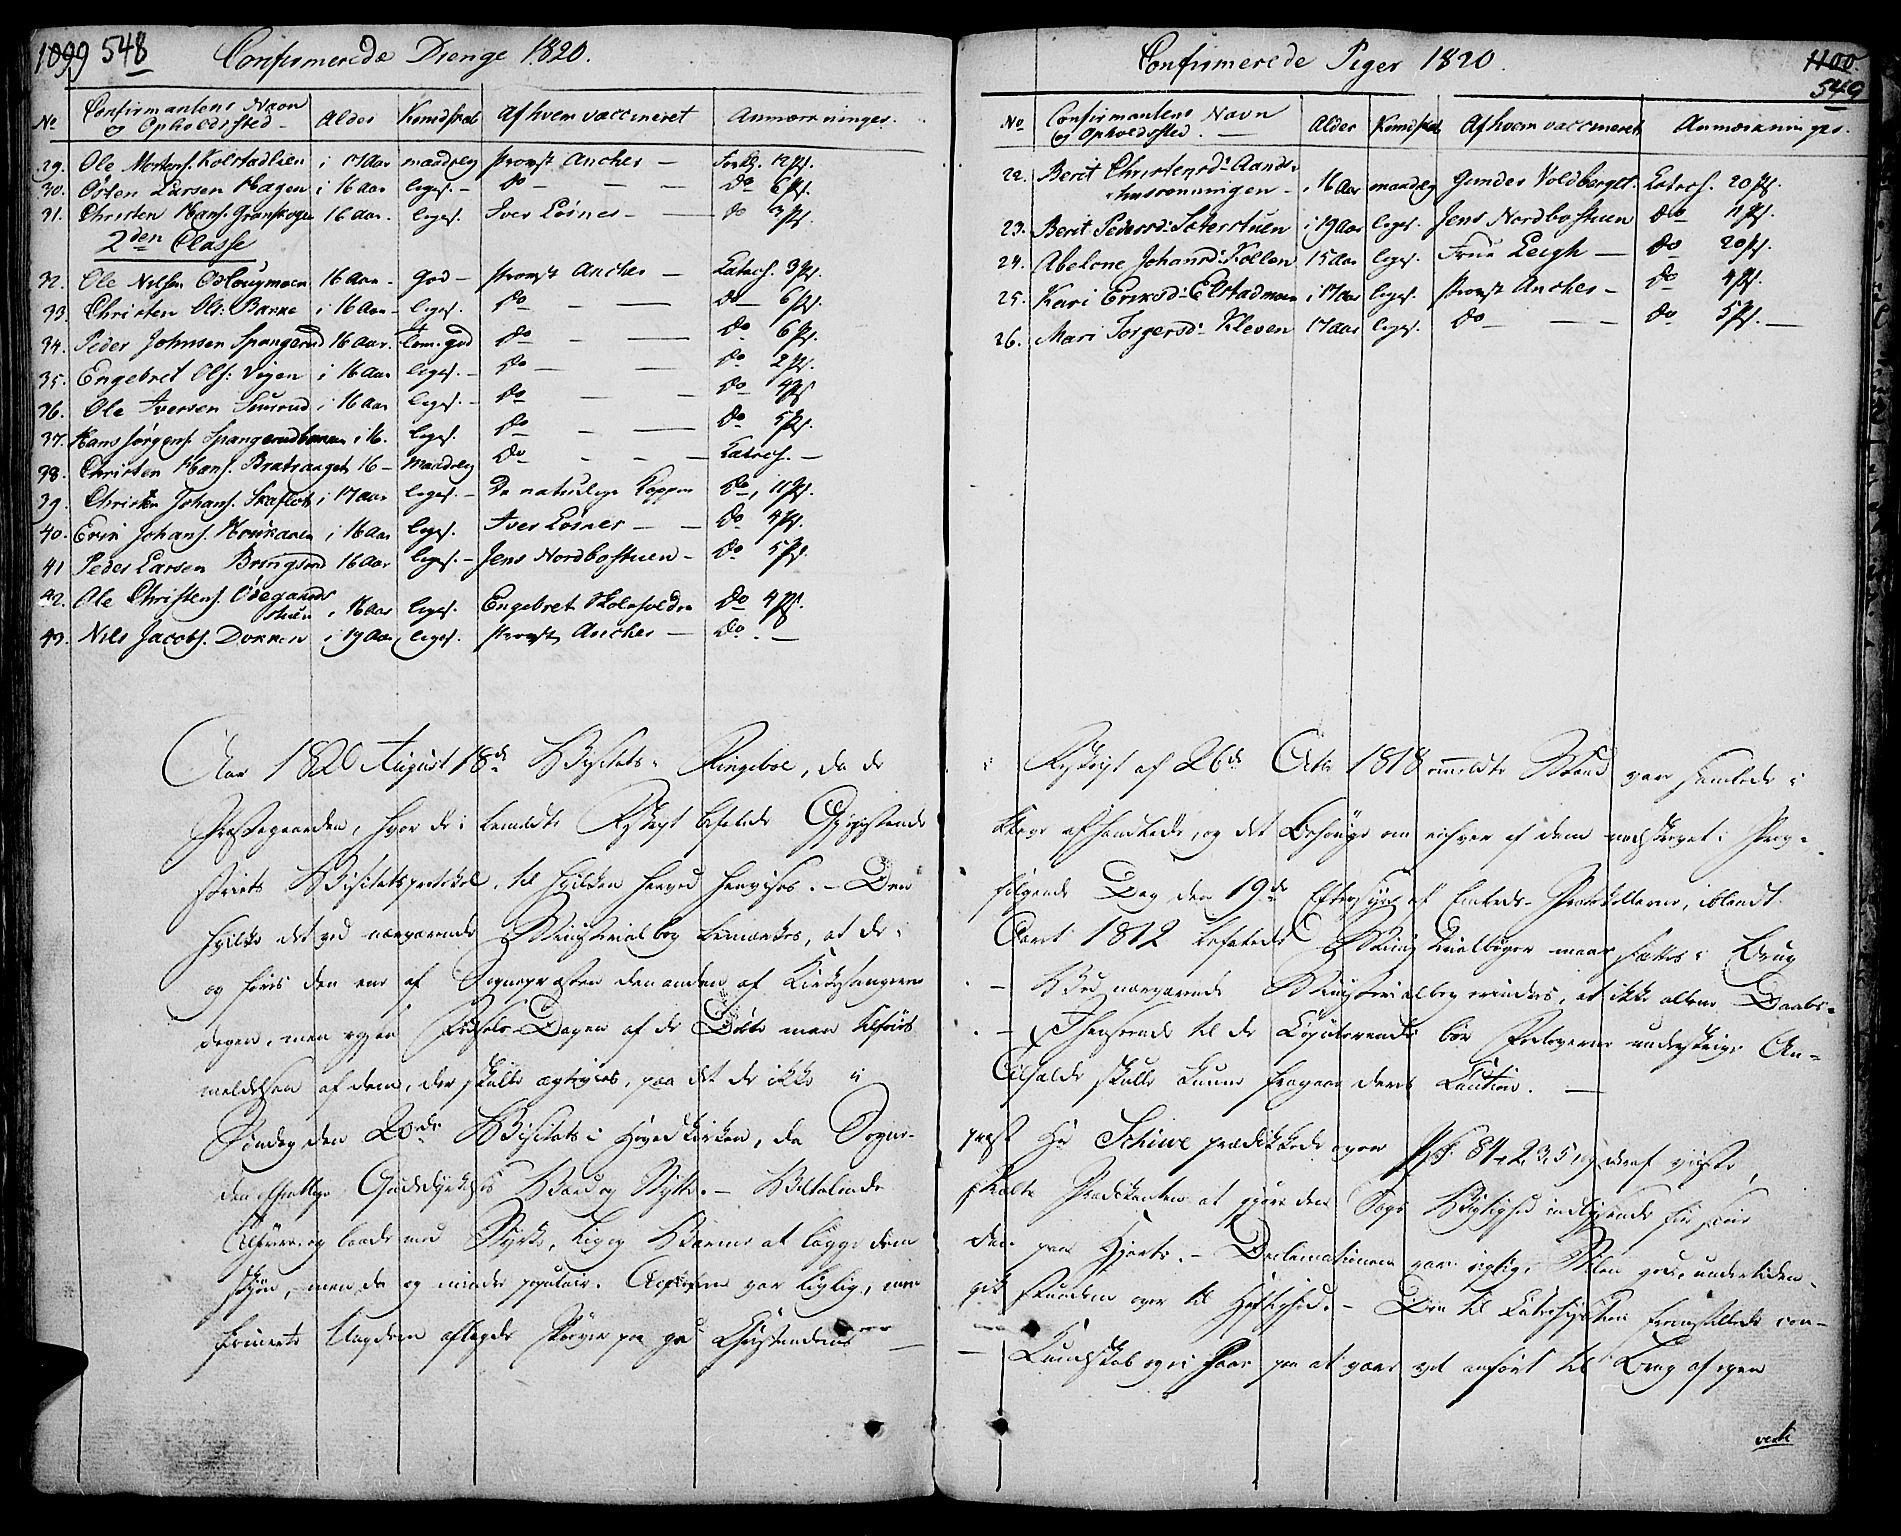 SAH, Ringebu prestekontor, Ministerialbok nr. 3, 1781-1820, s. 548-549